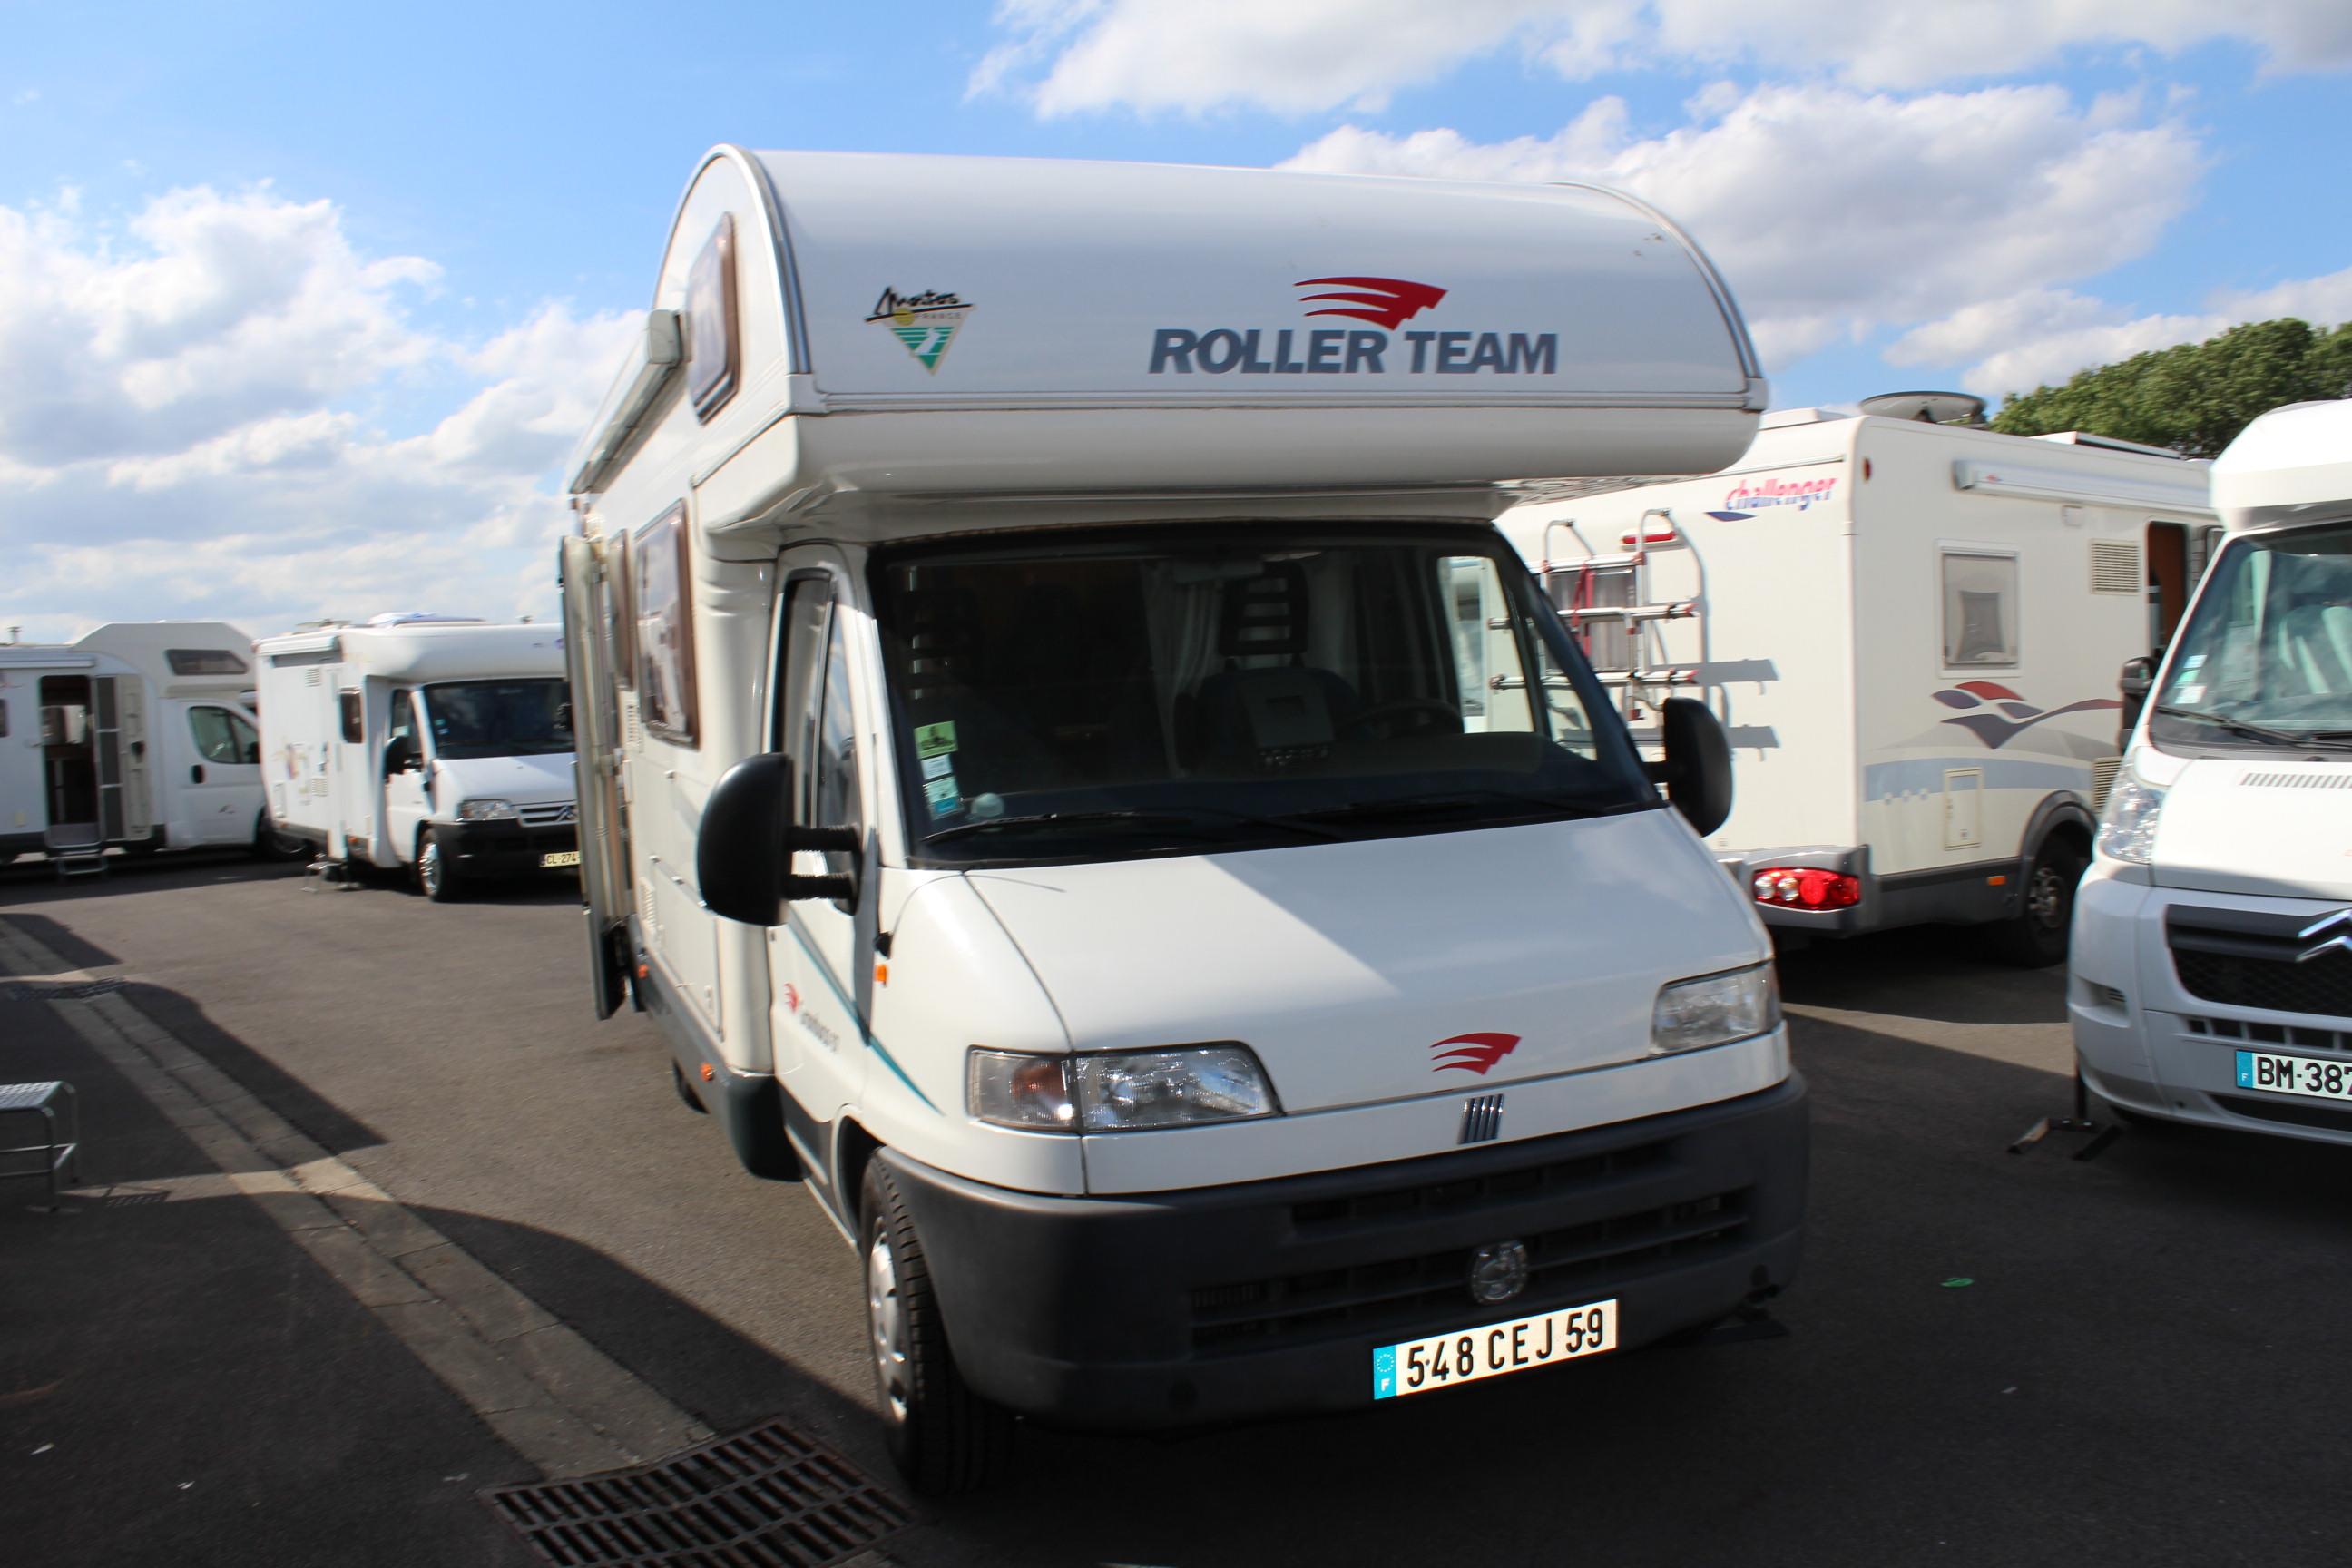 roller team granduca occasion porteur fiat ducato 2 8l camping car vendre en nord 59 ref. Black Bedroom Furniture Sets. Home Design Ideas